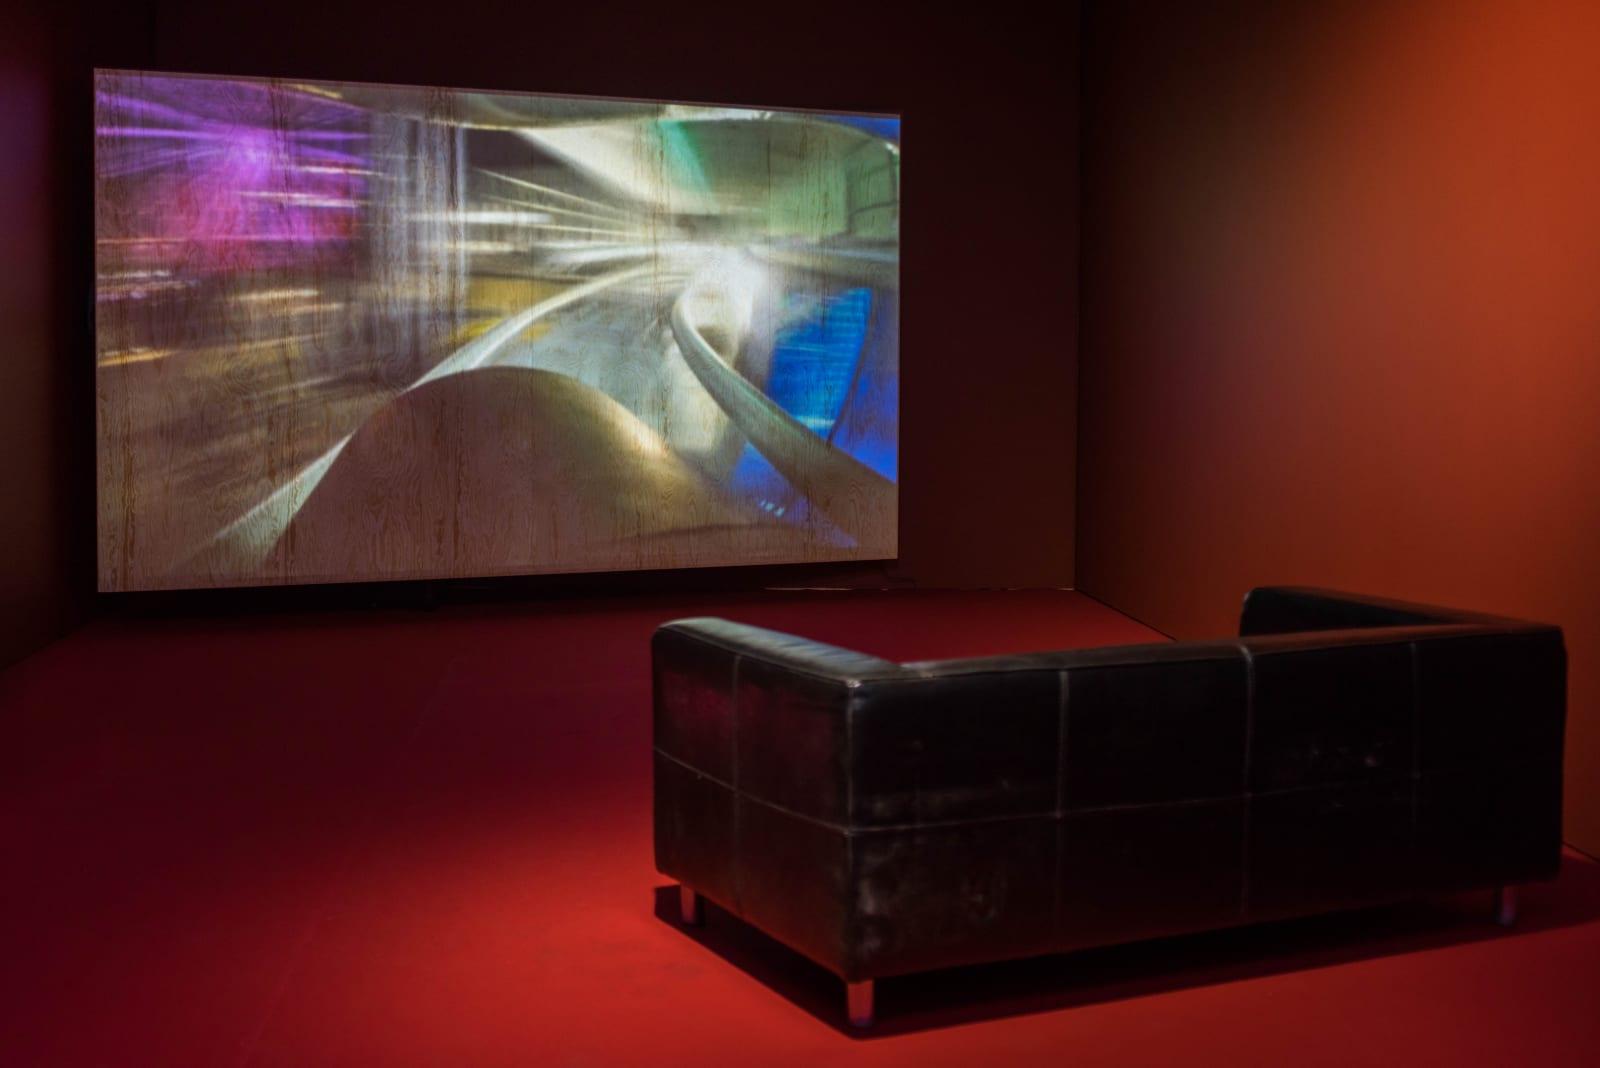 Katarina Löfström Installation view 'Insomnia' at Bonniers konsthall, Stockholm, Sweden, 2016